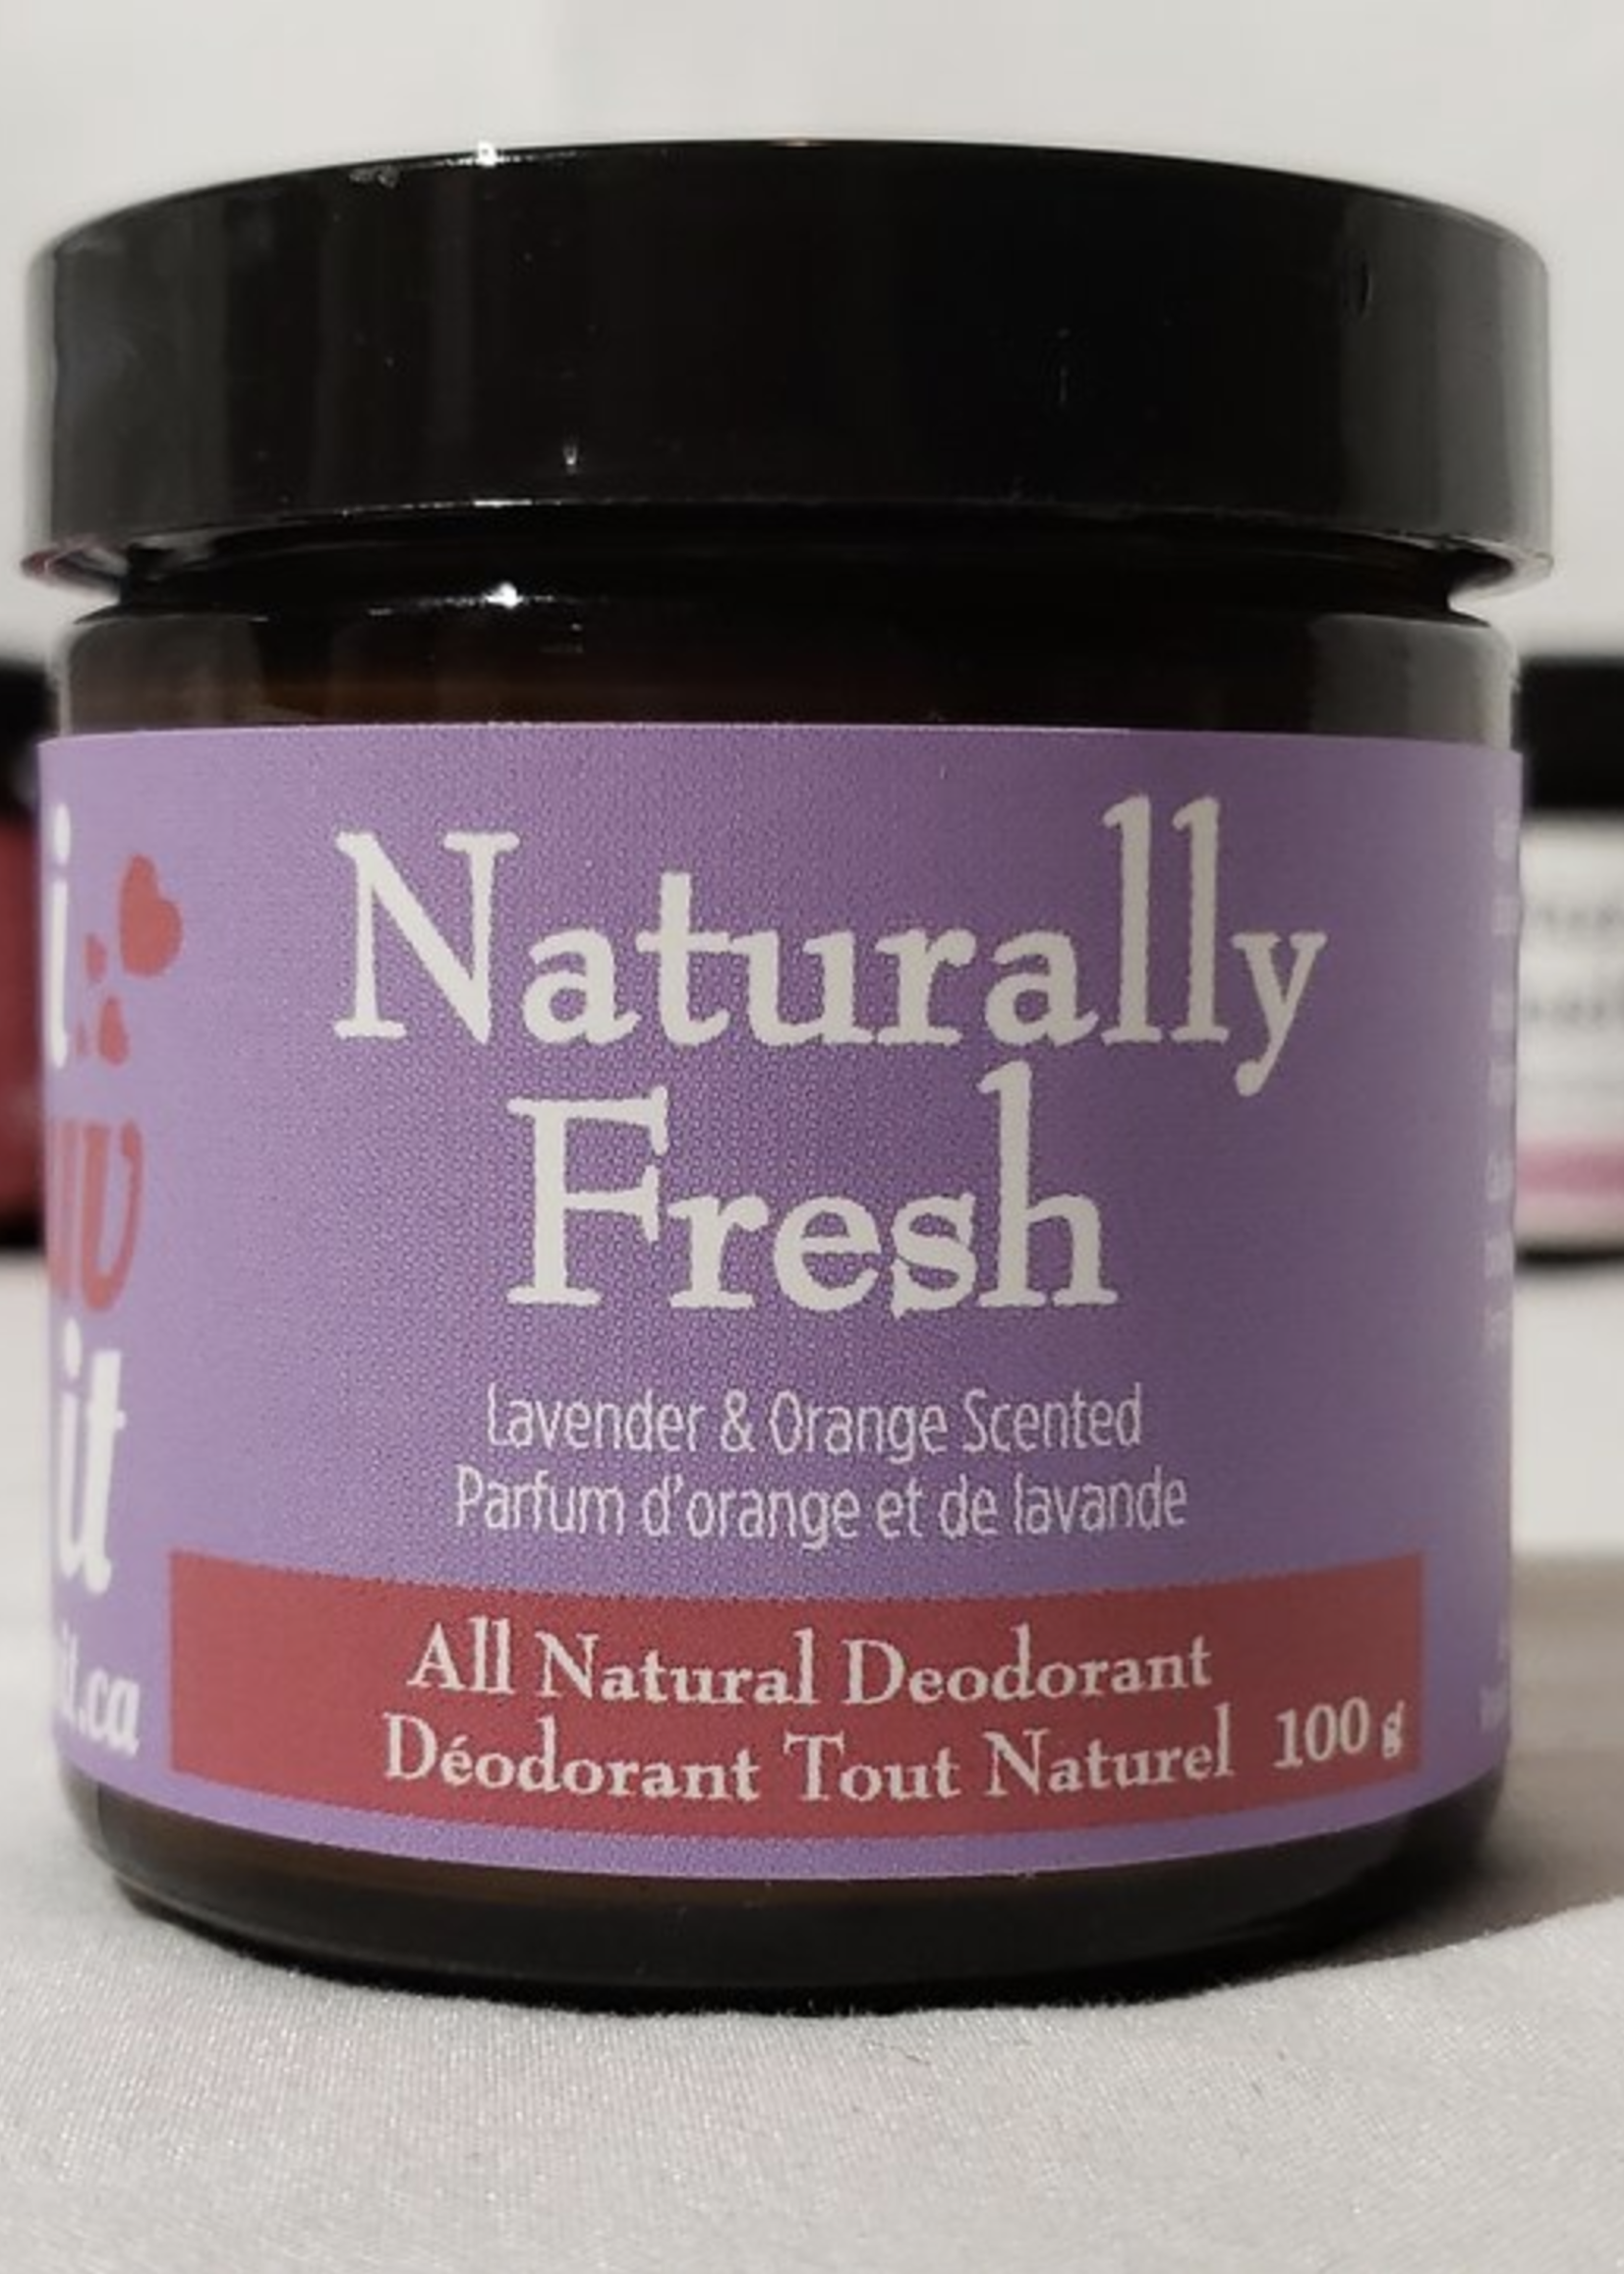 I Luv It Deodorant Naturally Fresh Deodorant